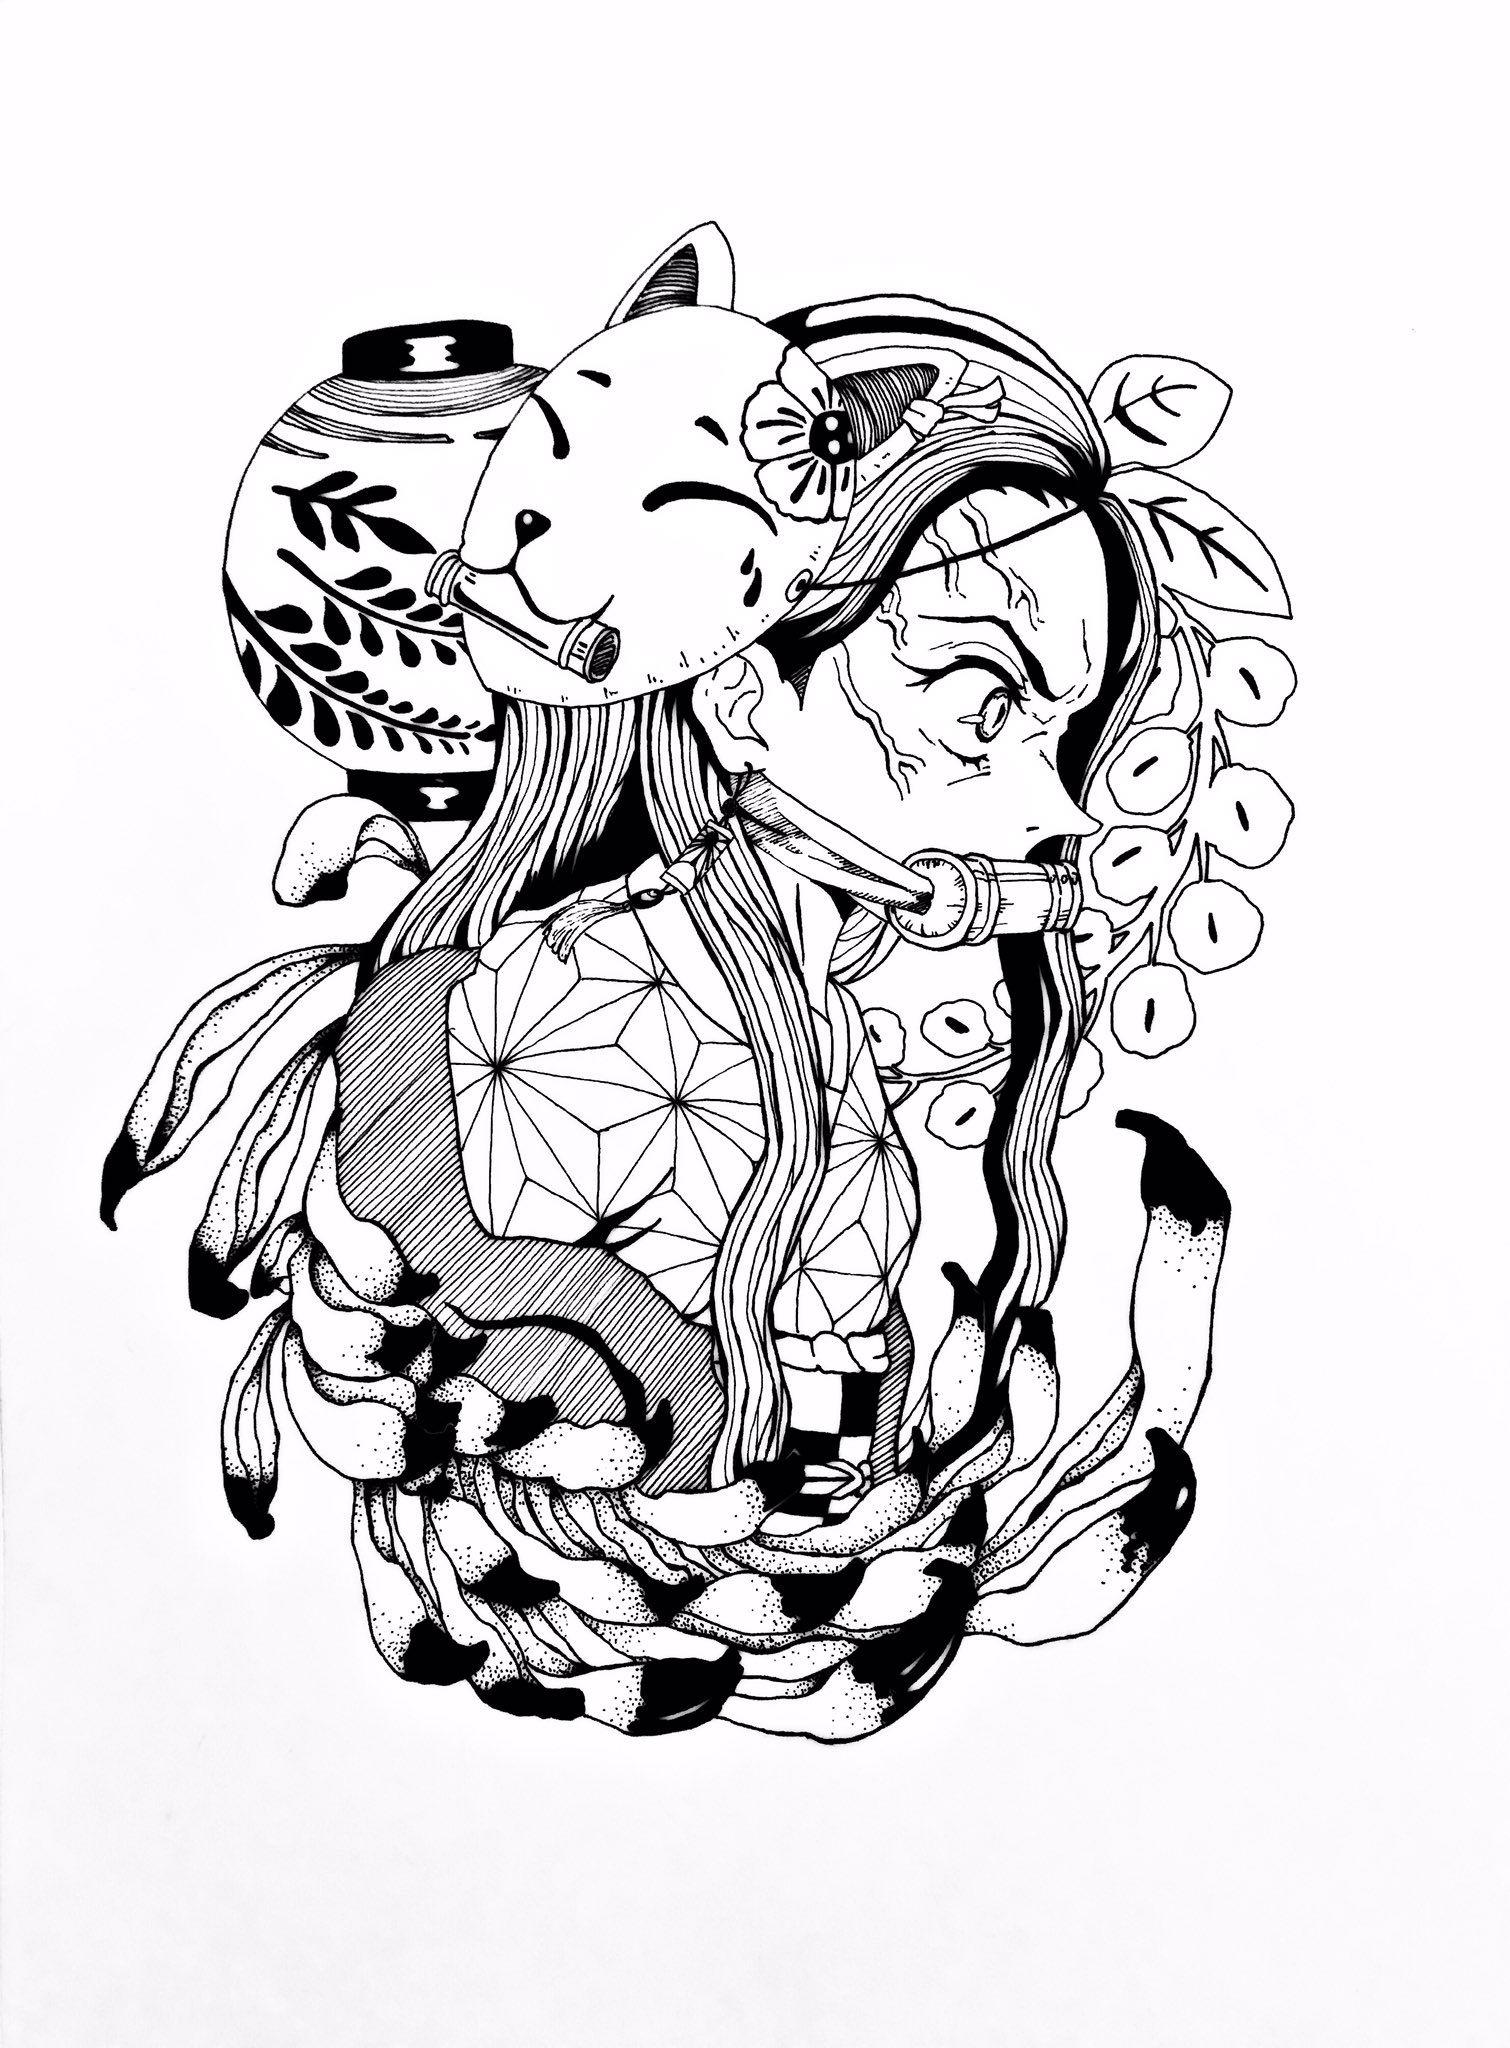 51 Deadliest Predator Tattoo Designs Ideas For Men: YA5U On In 2020 (With Images)